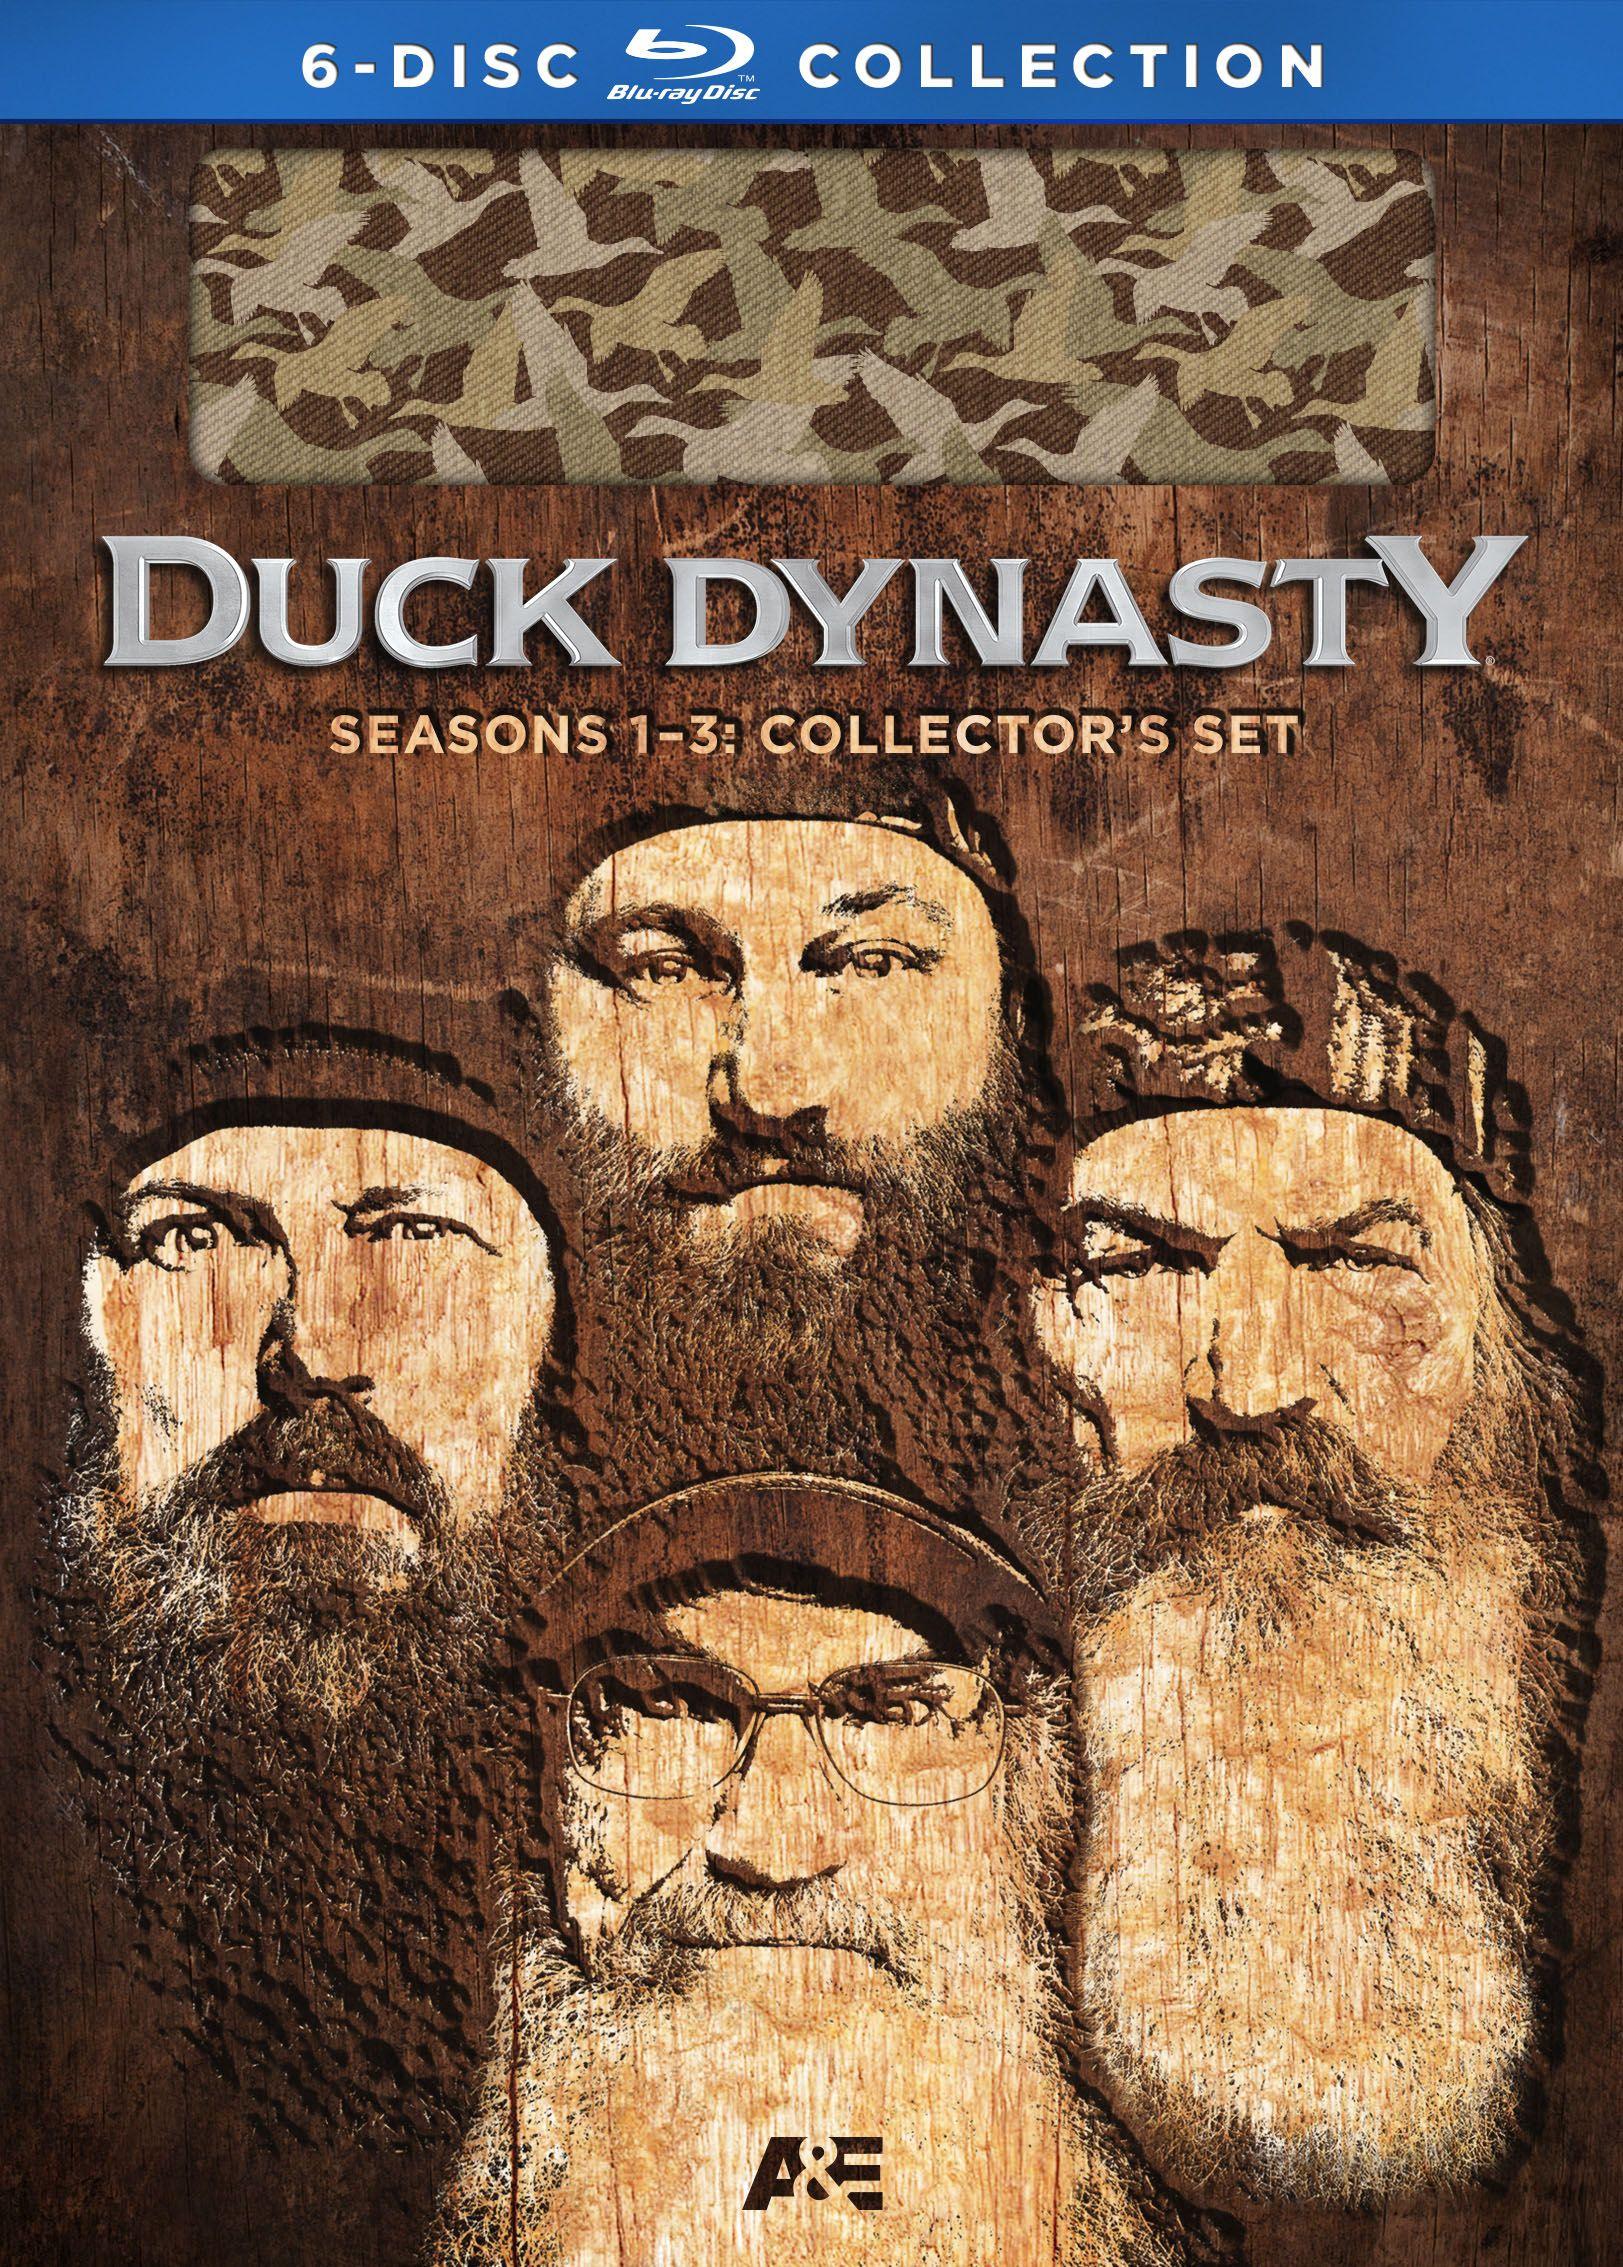 Duck Dynasty: Seasons 1-3 Collector's Set [6 Discs] [blu-ray] 2868482